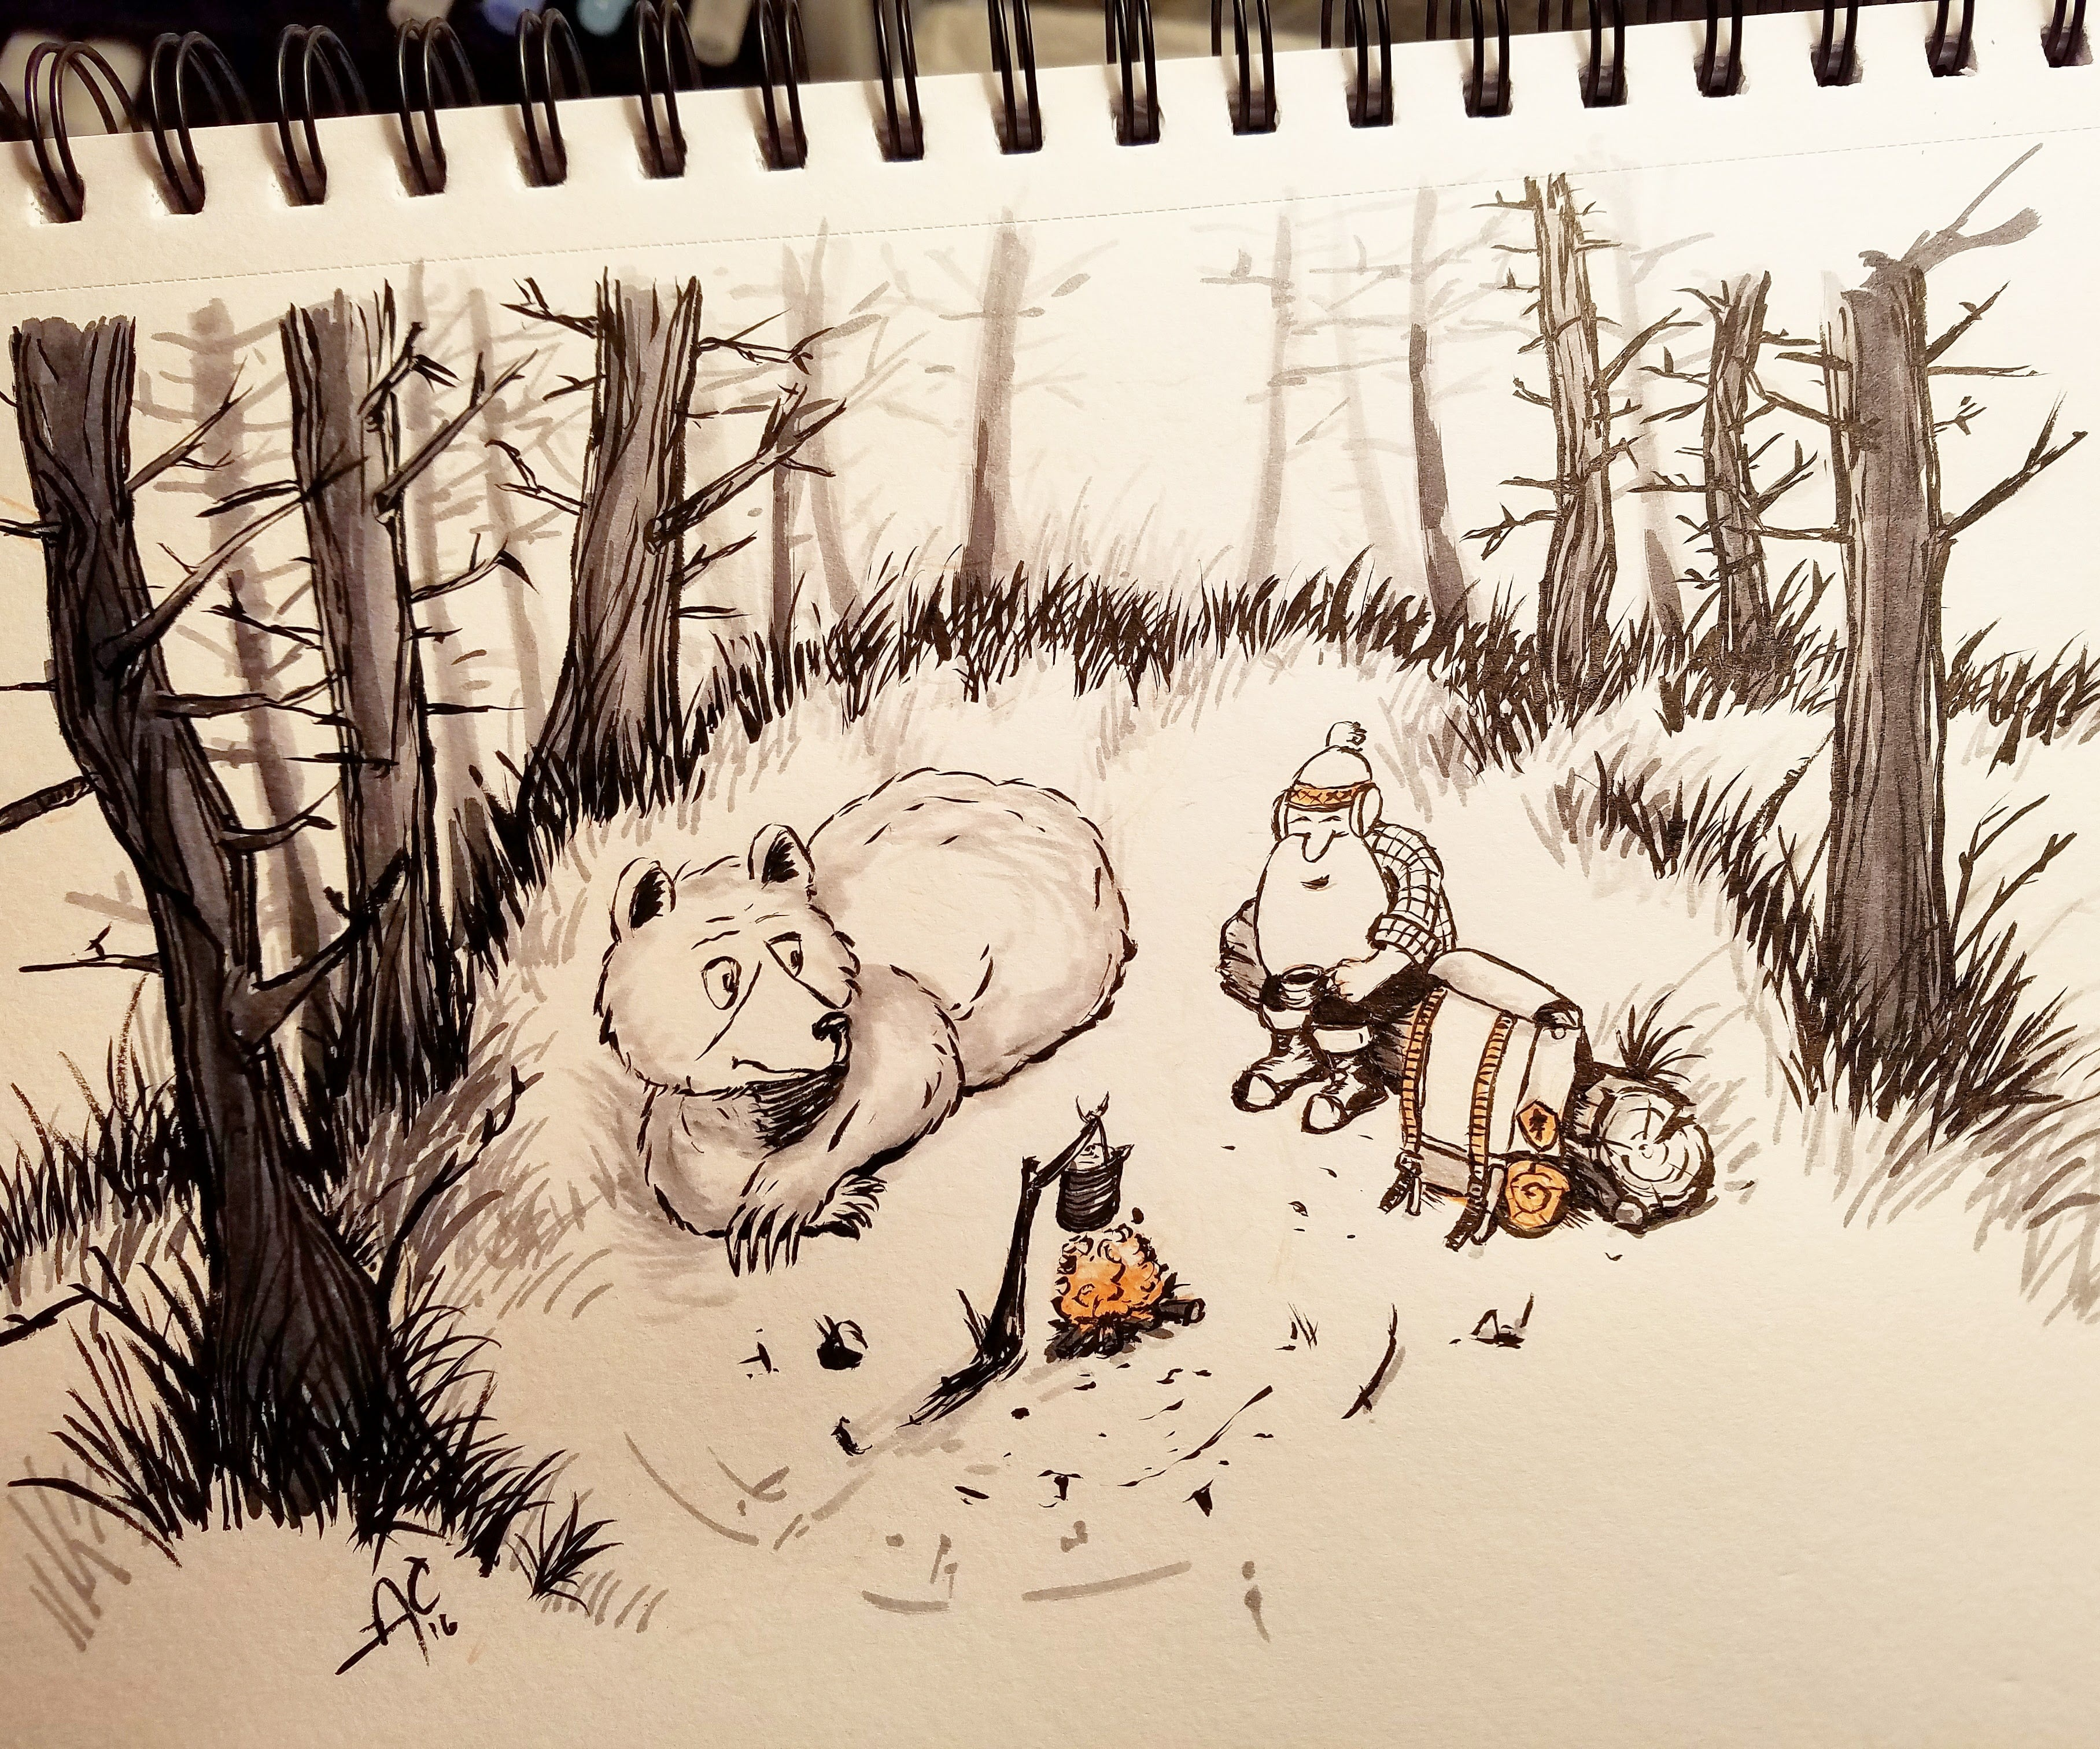 Bearcampfire